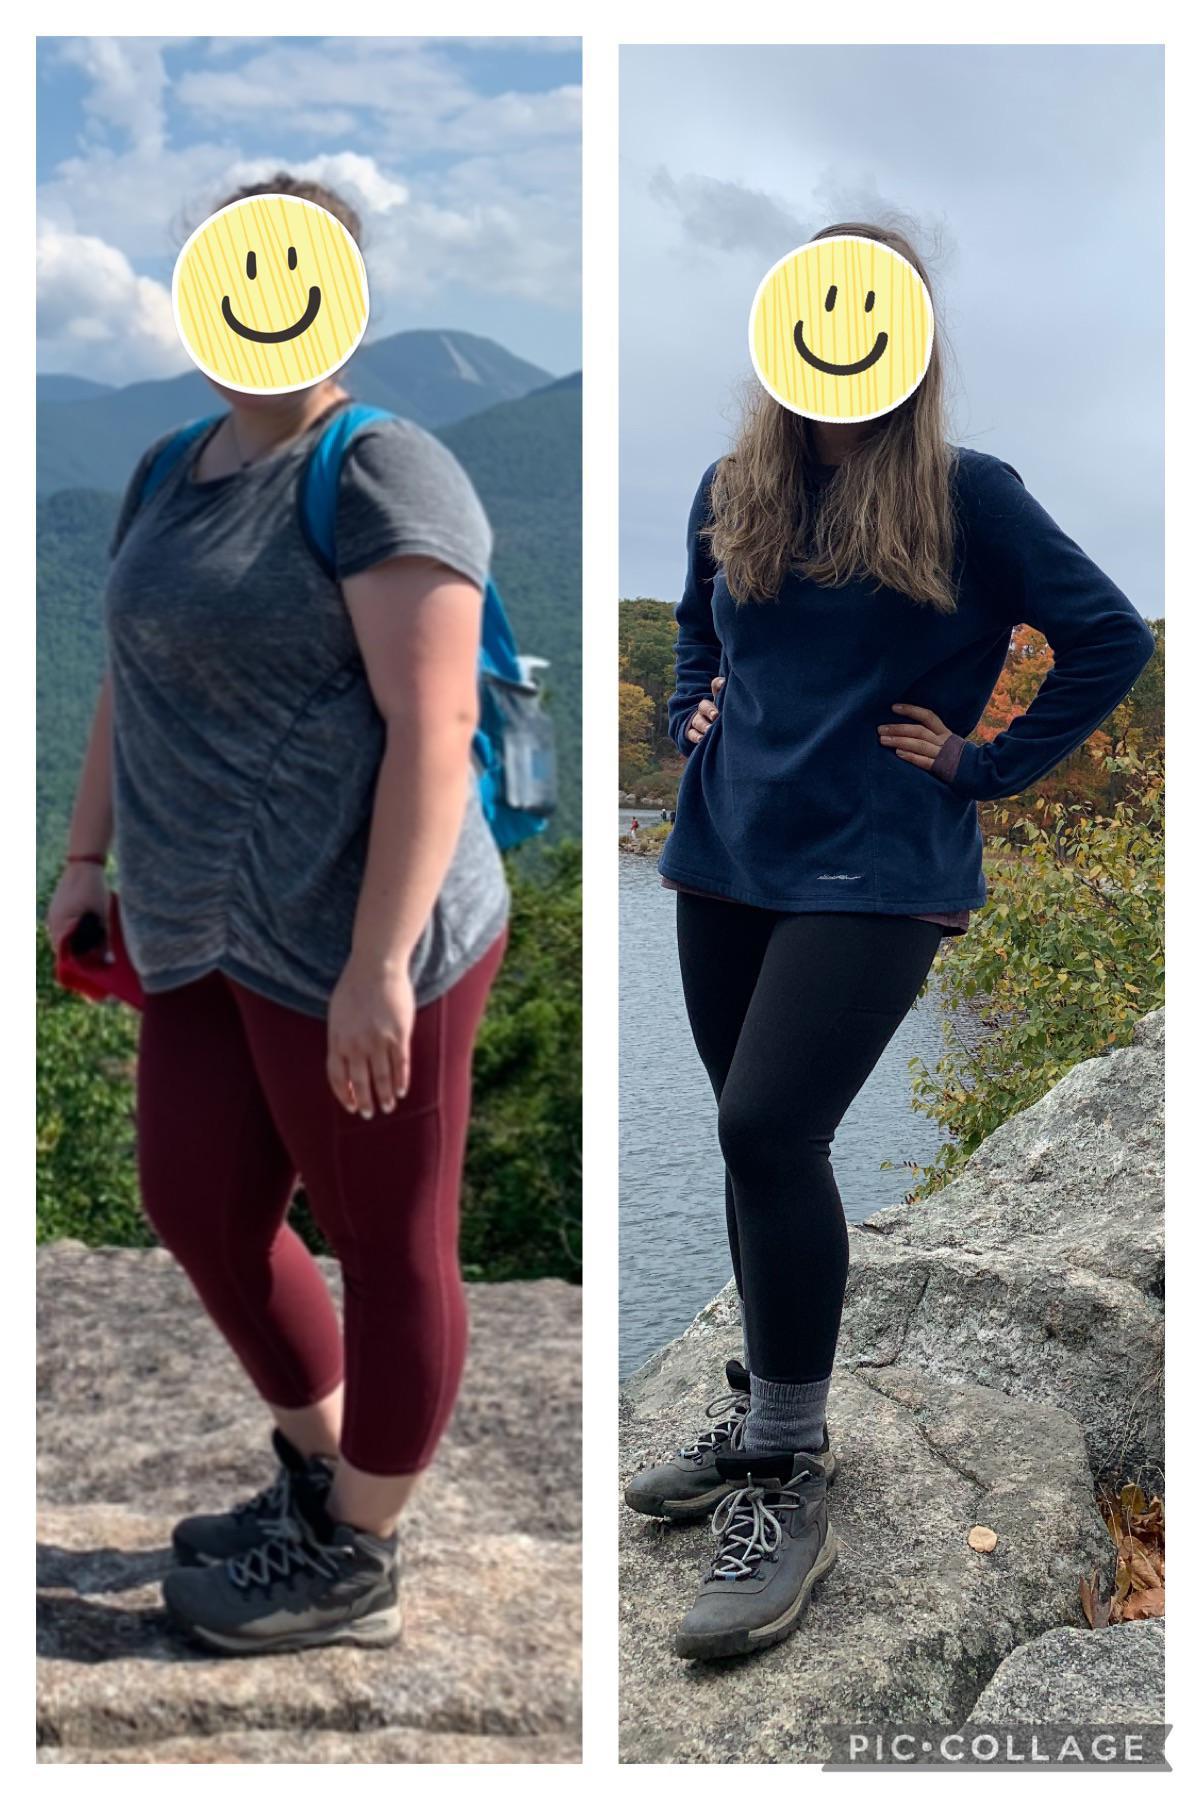 5 foot 5 Female 68 lbs Fat Loss 225 lbs to 157 lbs